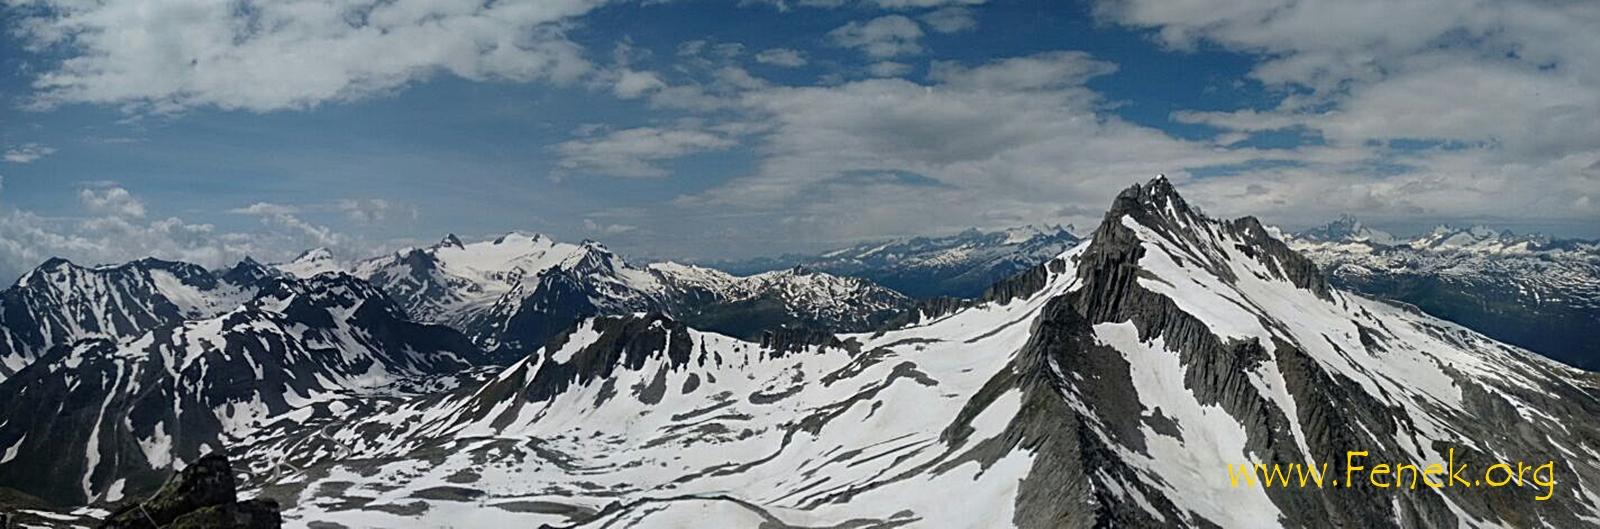 Panorama - ganz rechts Pizzo Gallina